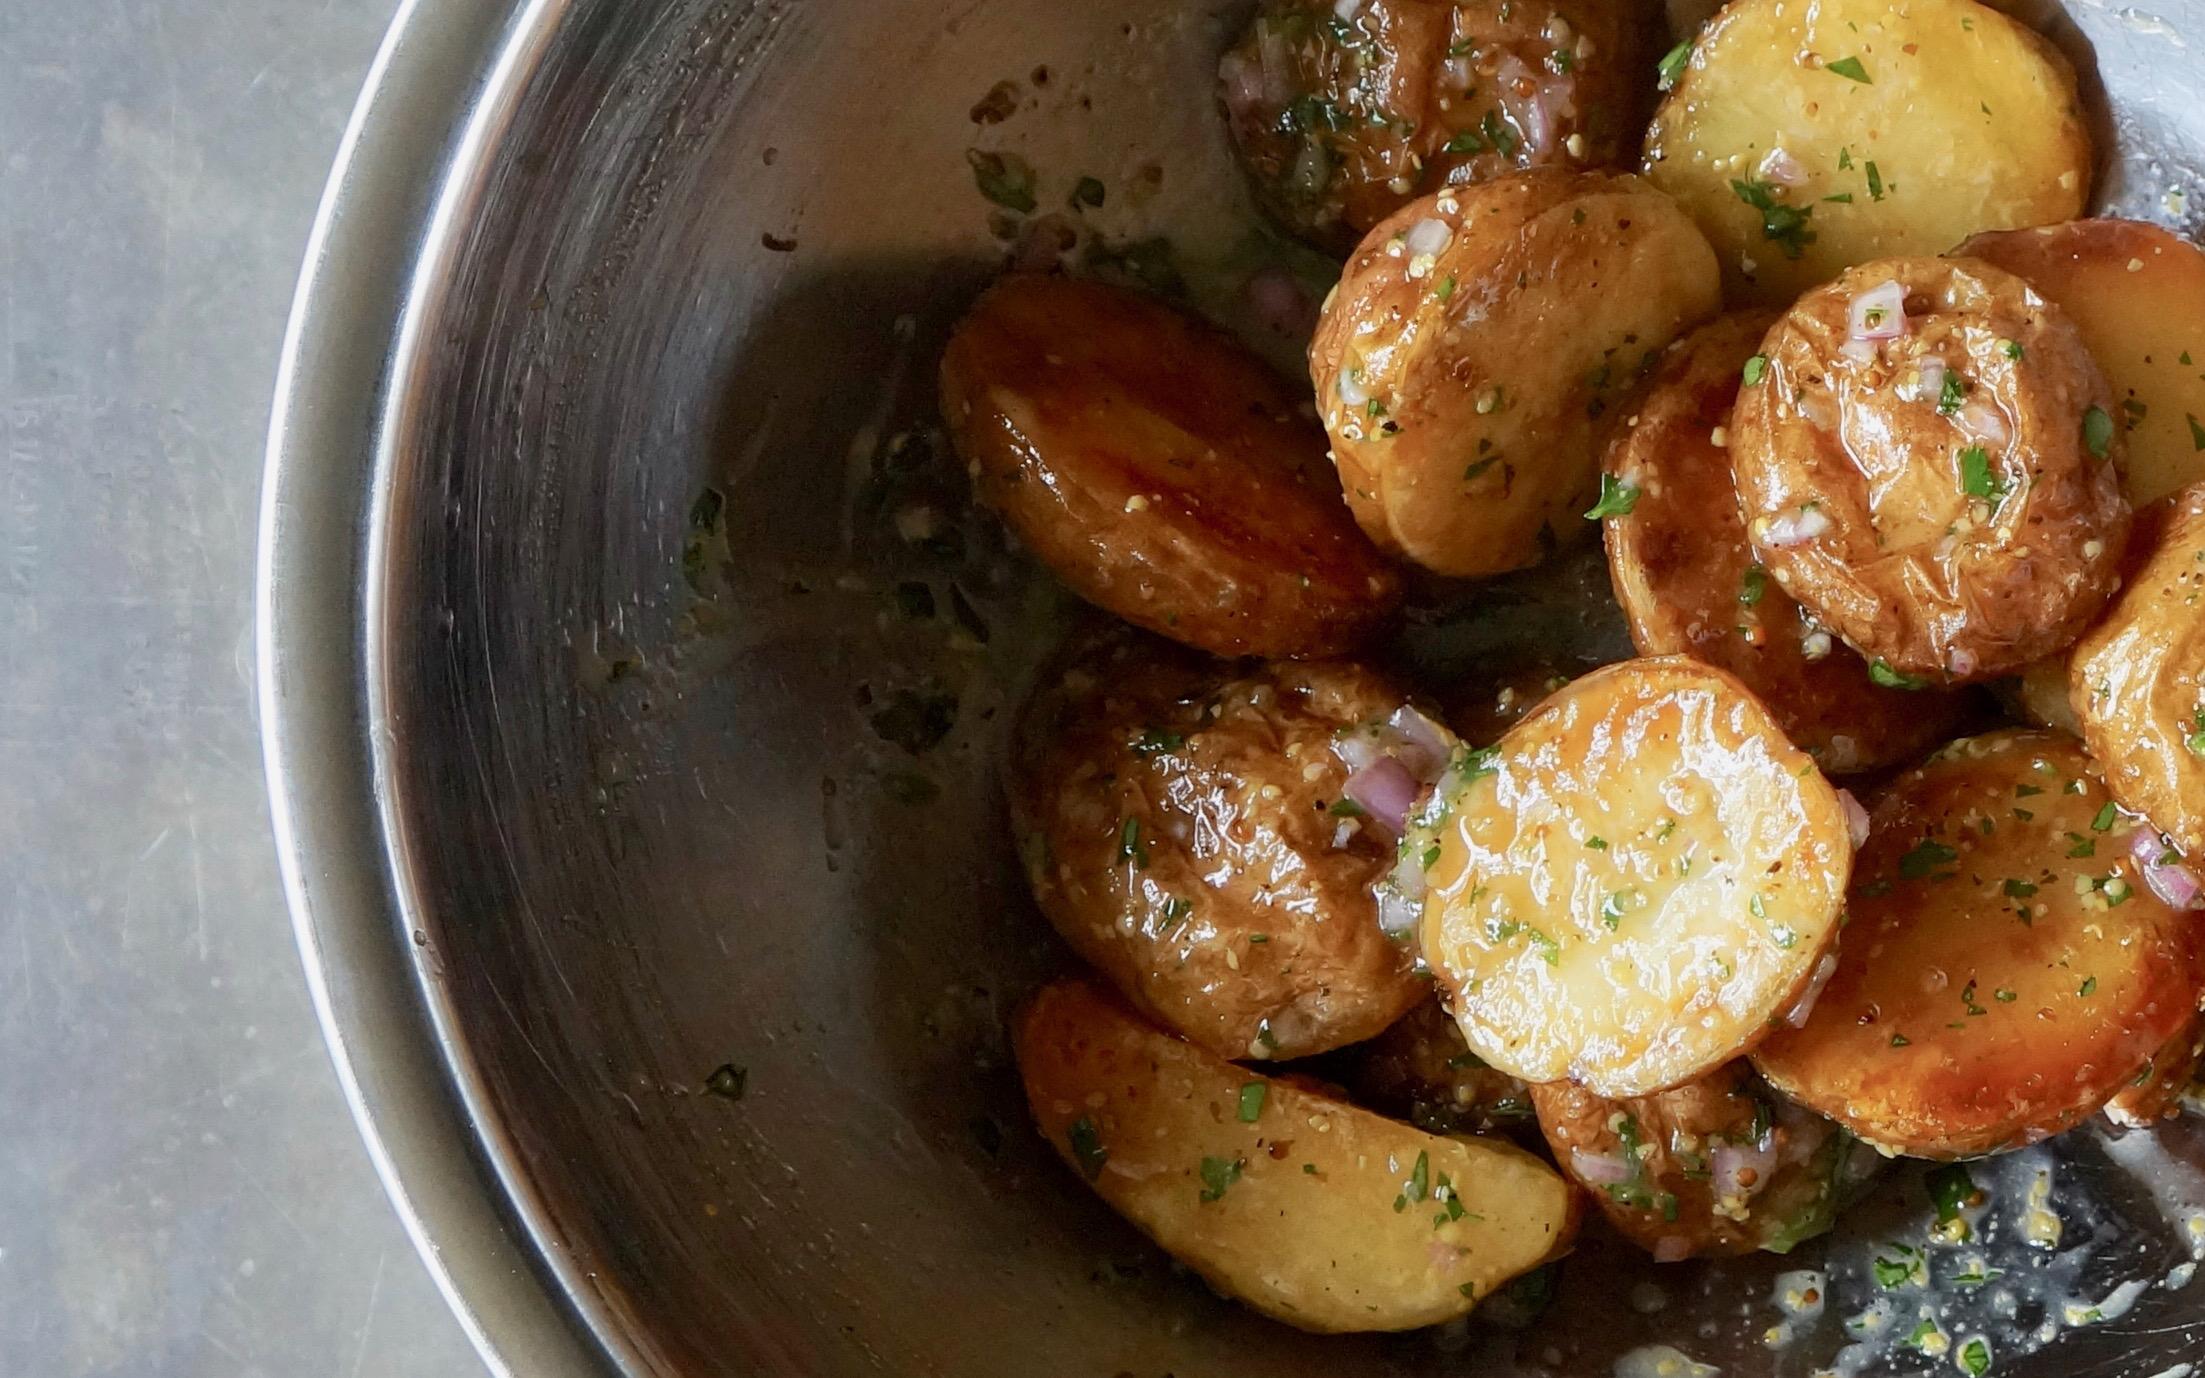 Bourbon-Mustard-Roasted Potato Salad-Rebecca-Gordon-Publisher-Buttermilk-Lipstick-Culinary-Entertaining-Technique-RebeccaGordon-Pastry-Chef-Birmingham-Alabama